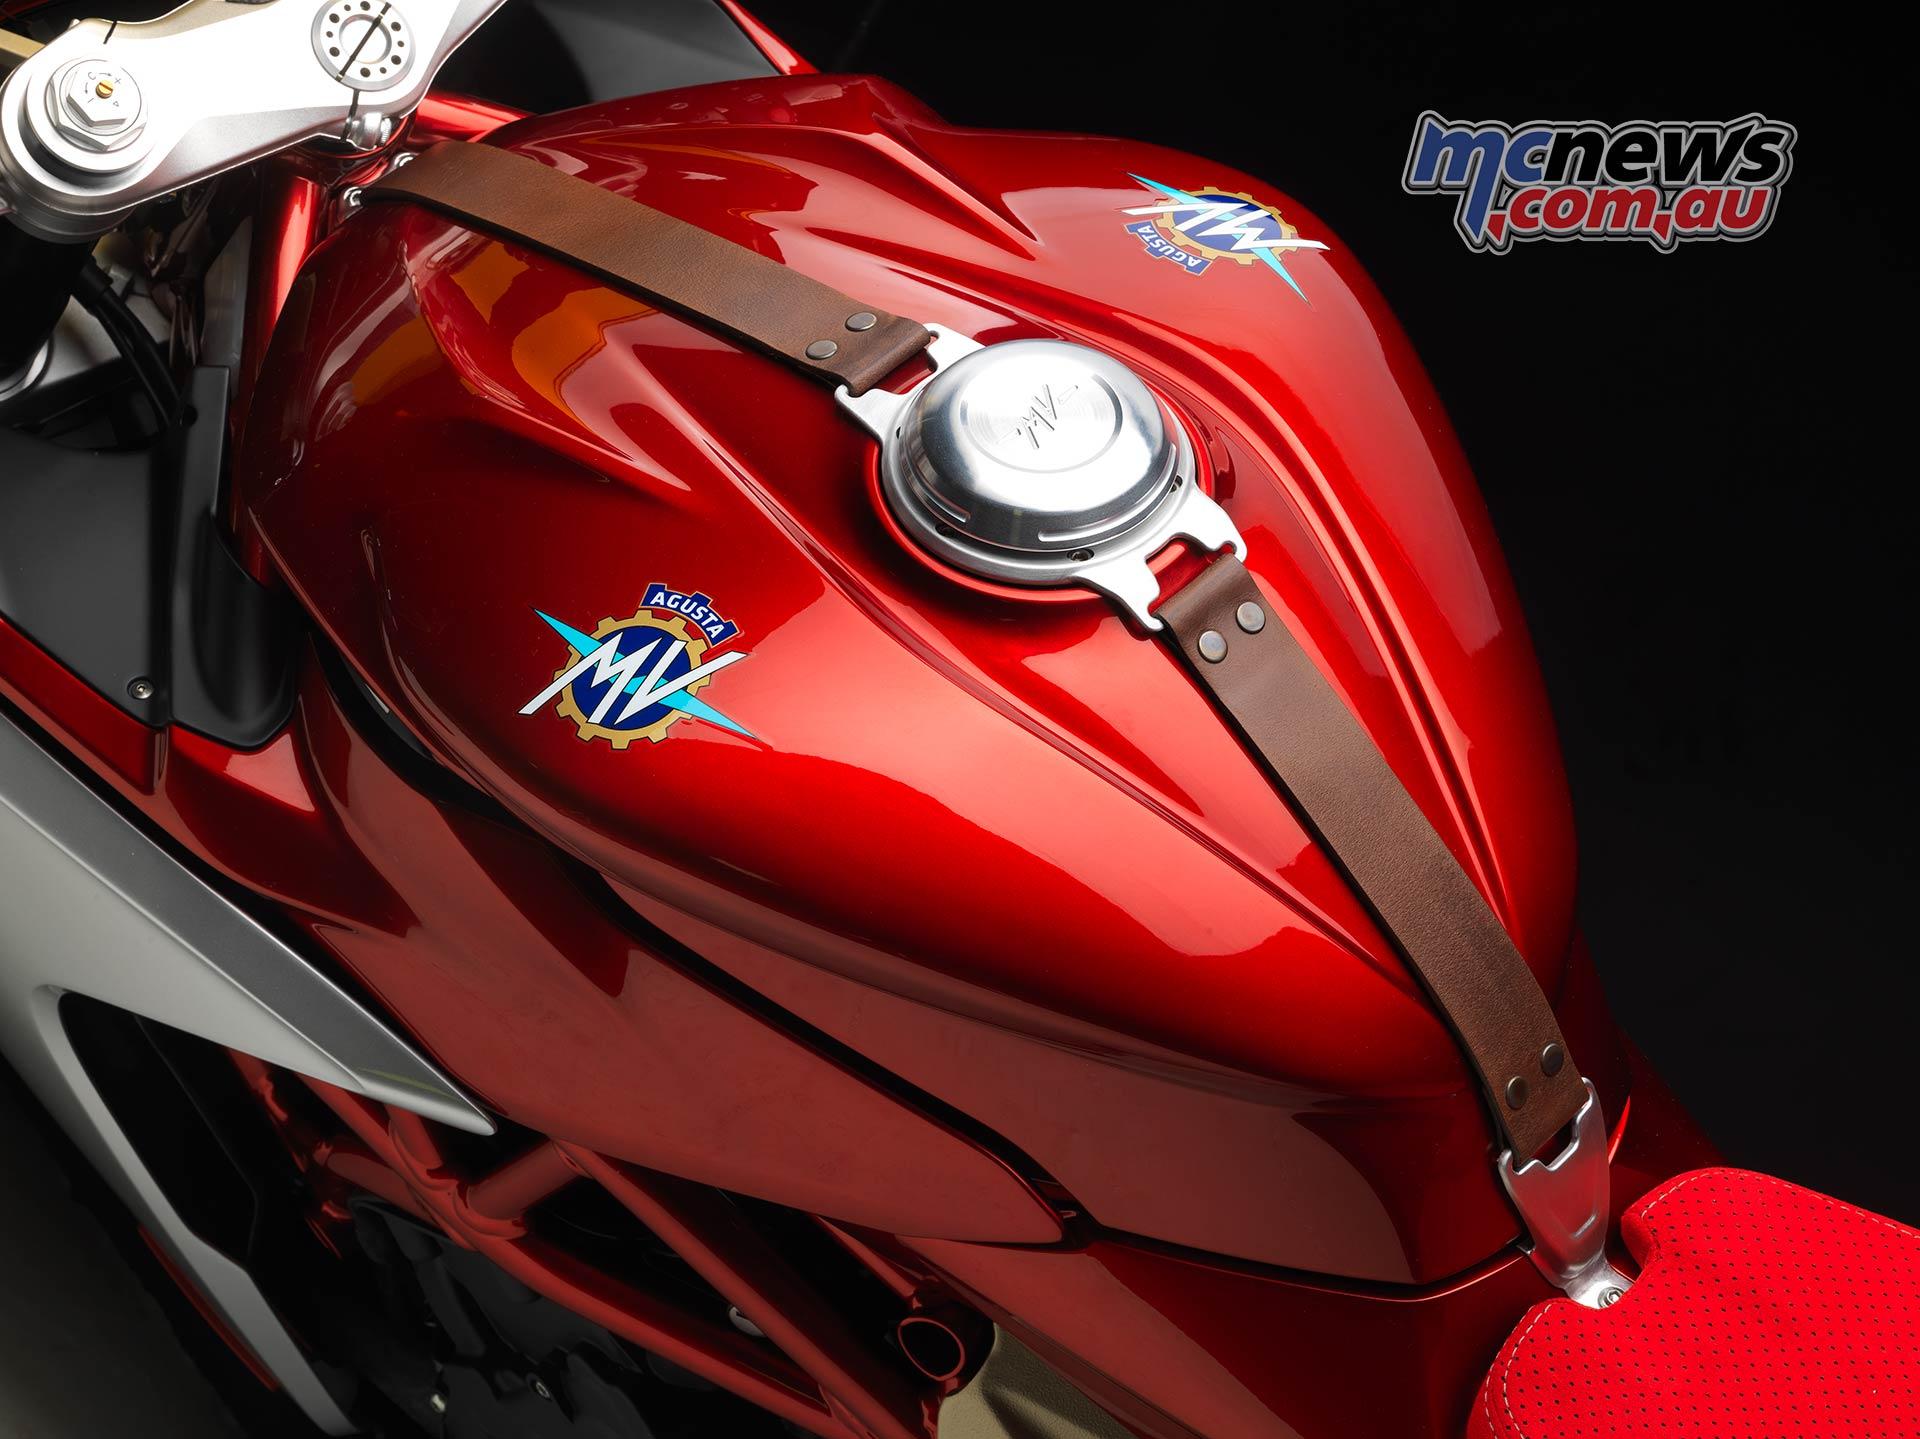 Mv Agusta Superveloce 800 F3 Sports Base Heritage